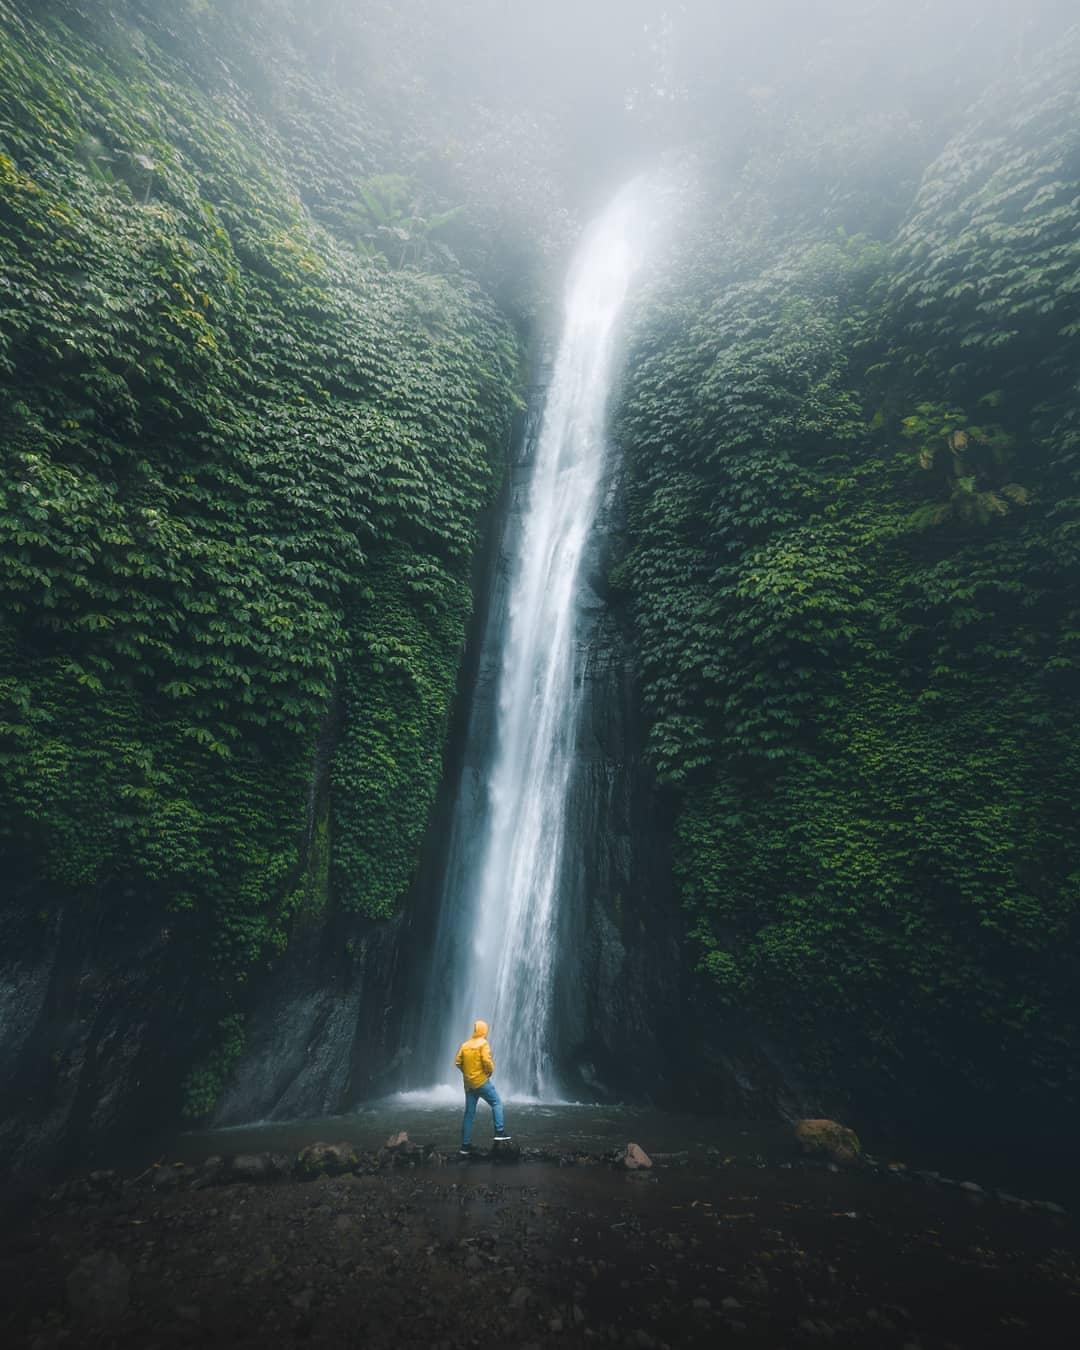 Bali (pandde._)